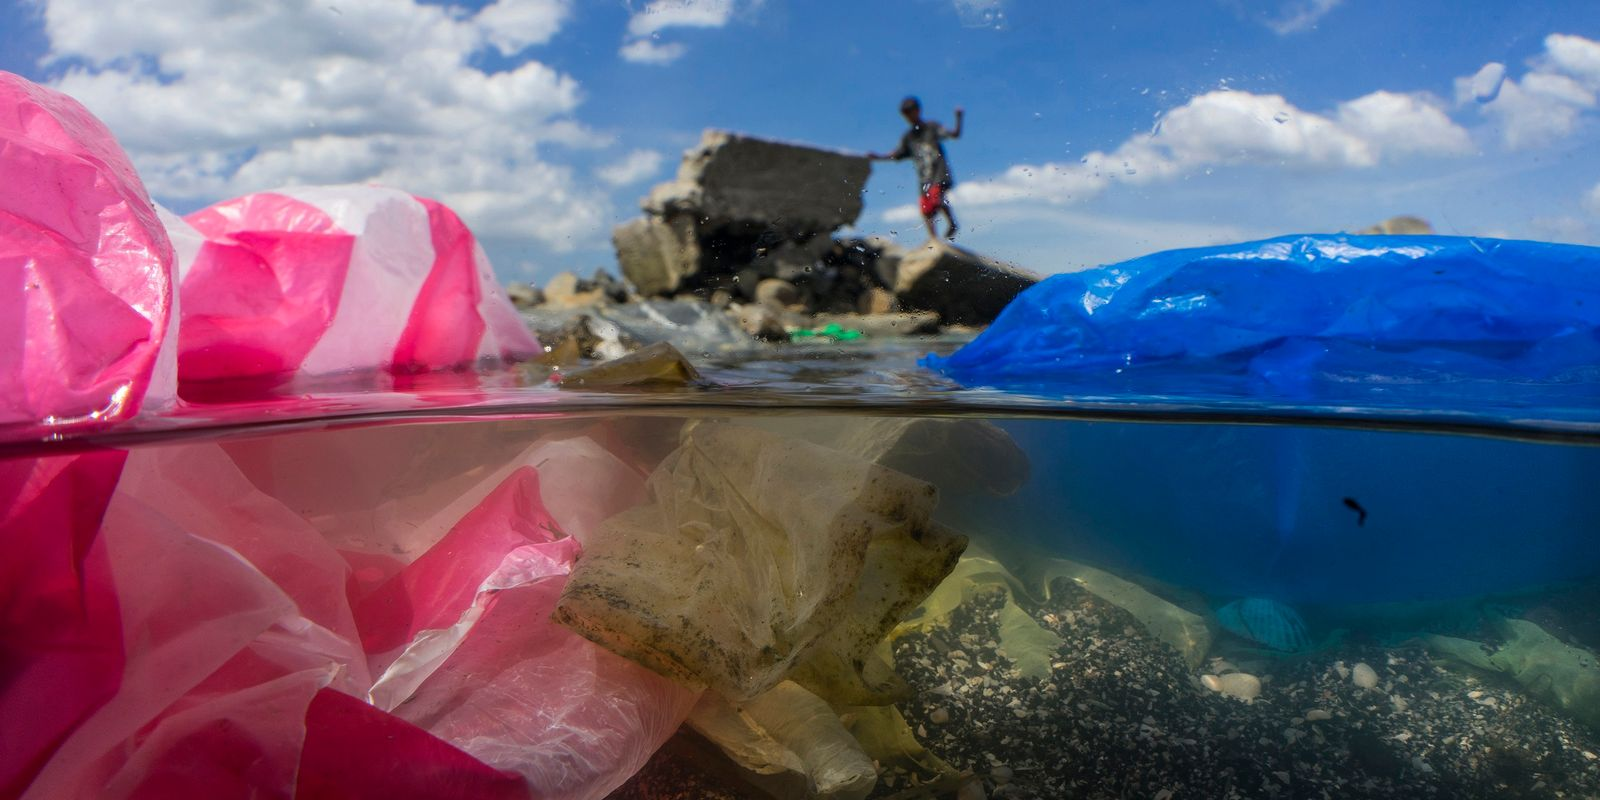 Luta contra plásticos descartáveis é atropelada durante a pandemia